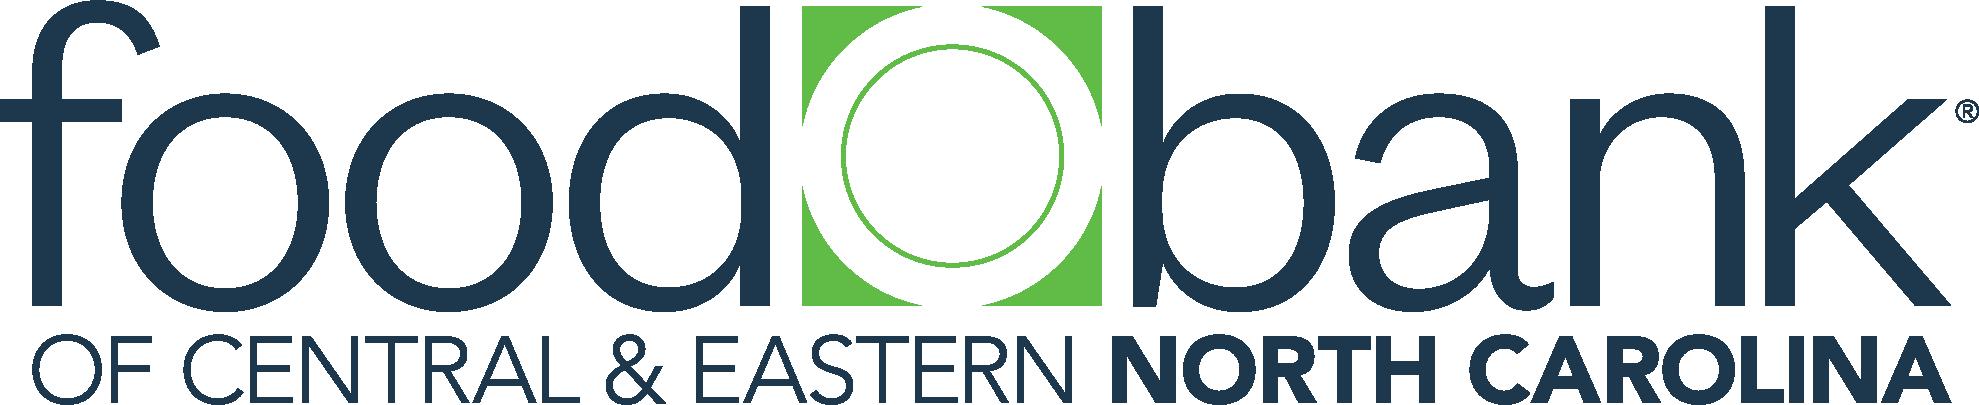 Food Bank of Central & Eastern North Carolina